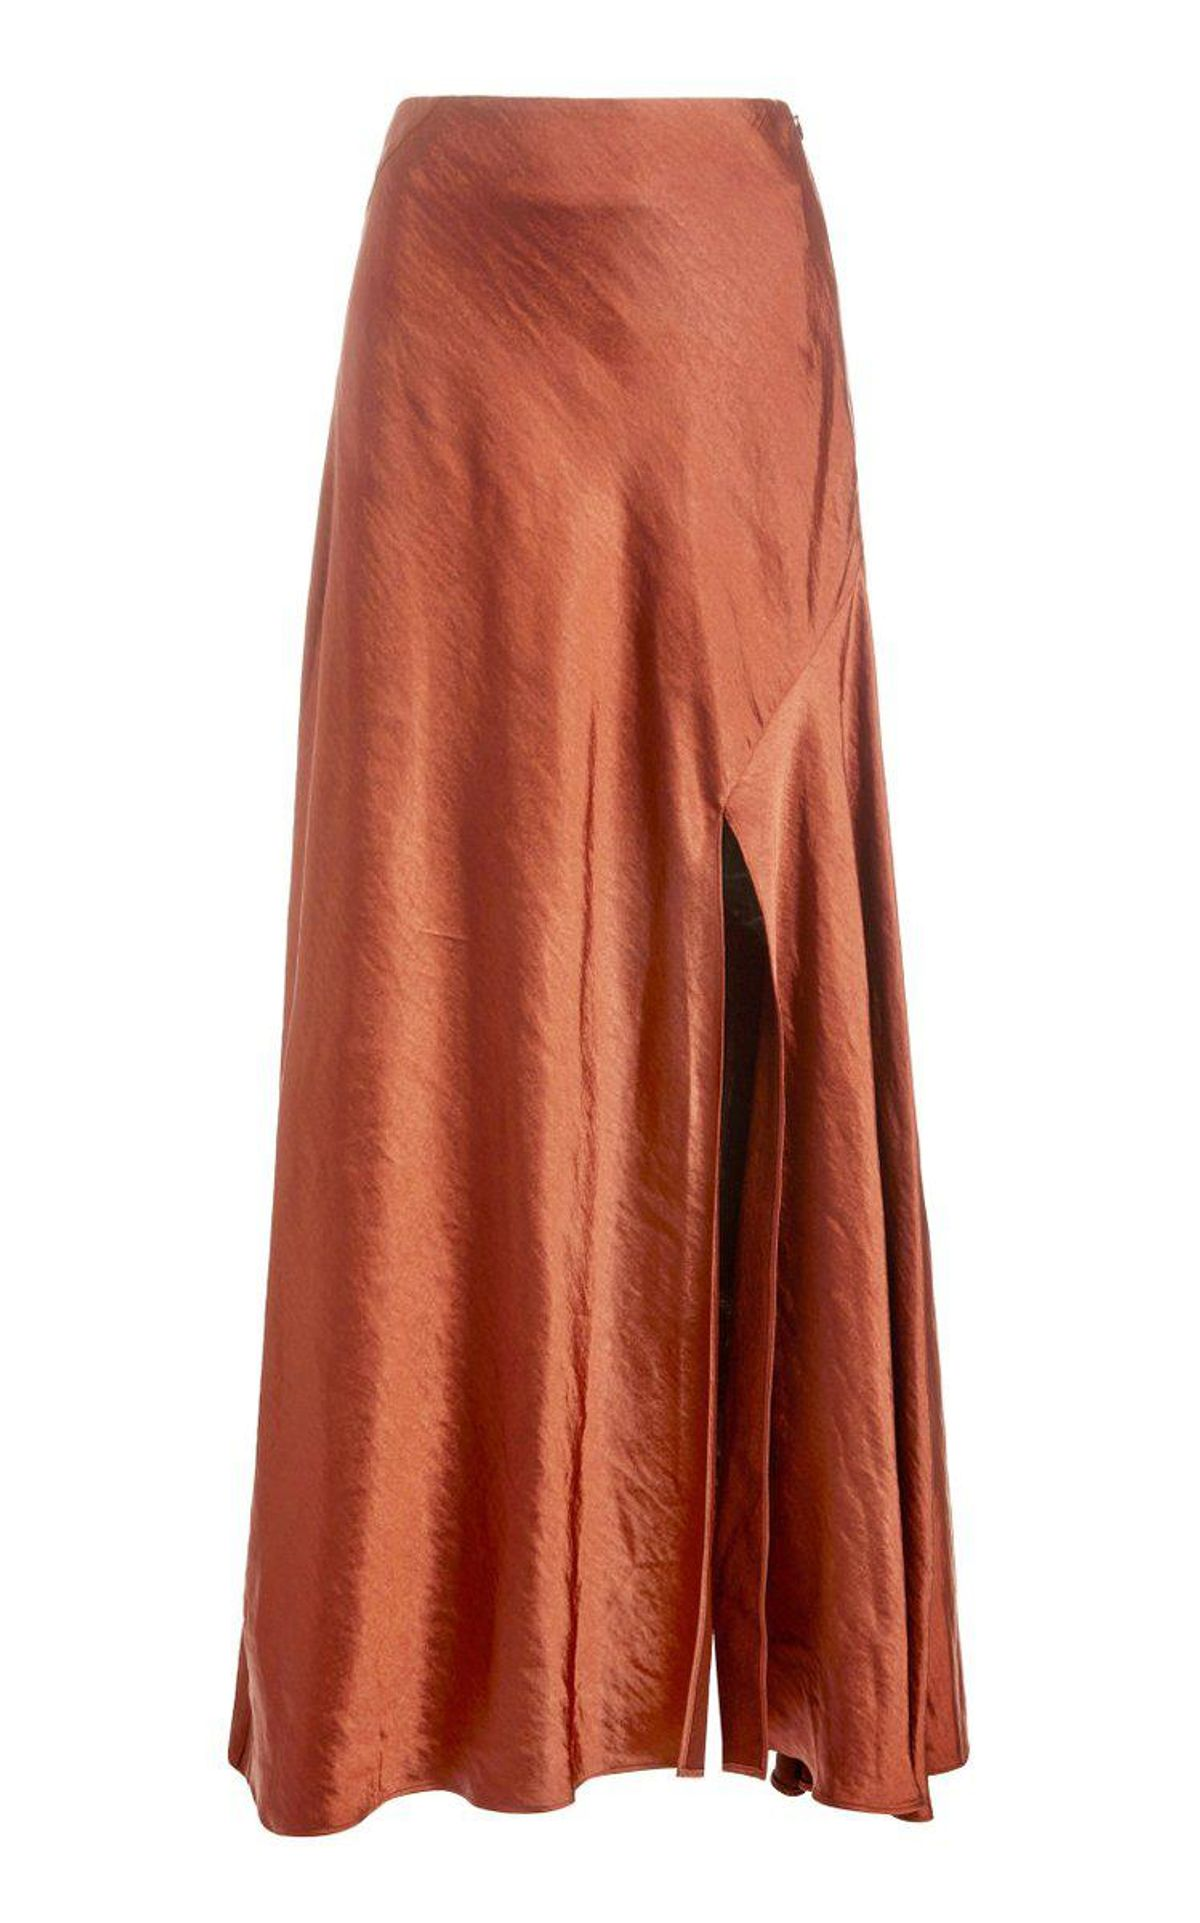 Aura High Rise Satin Skirt